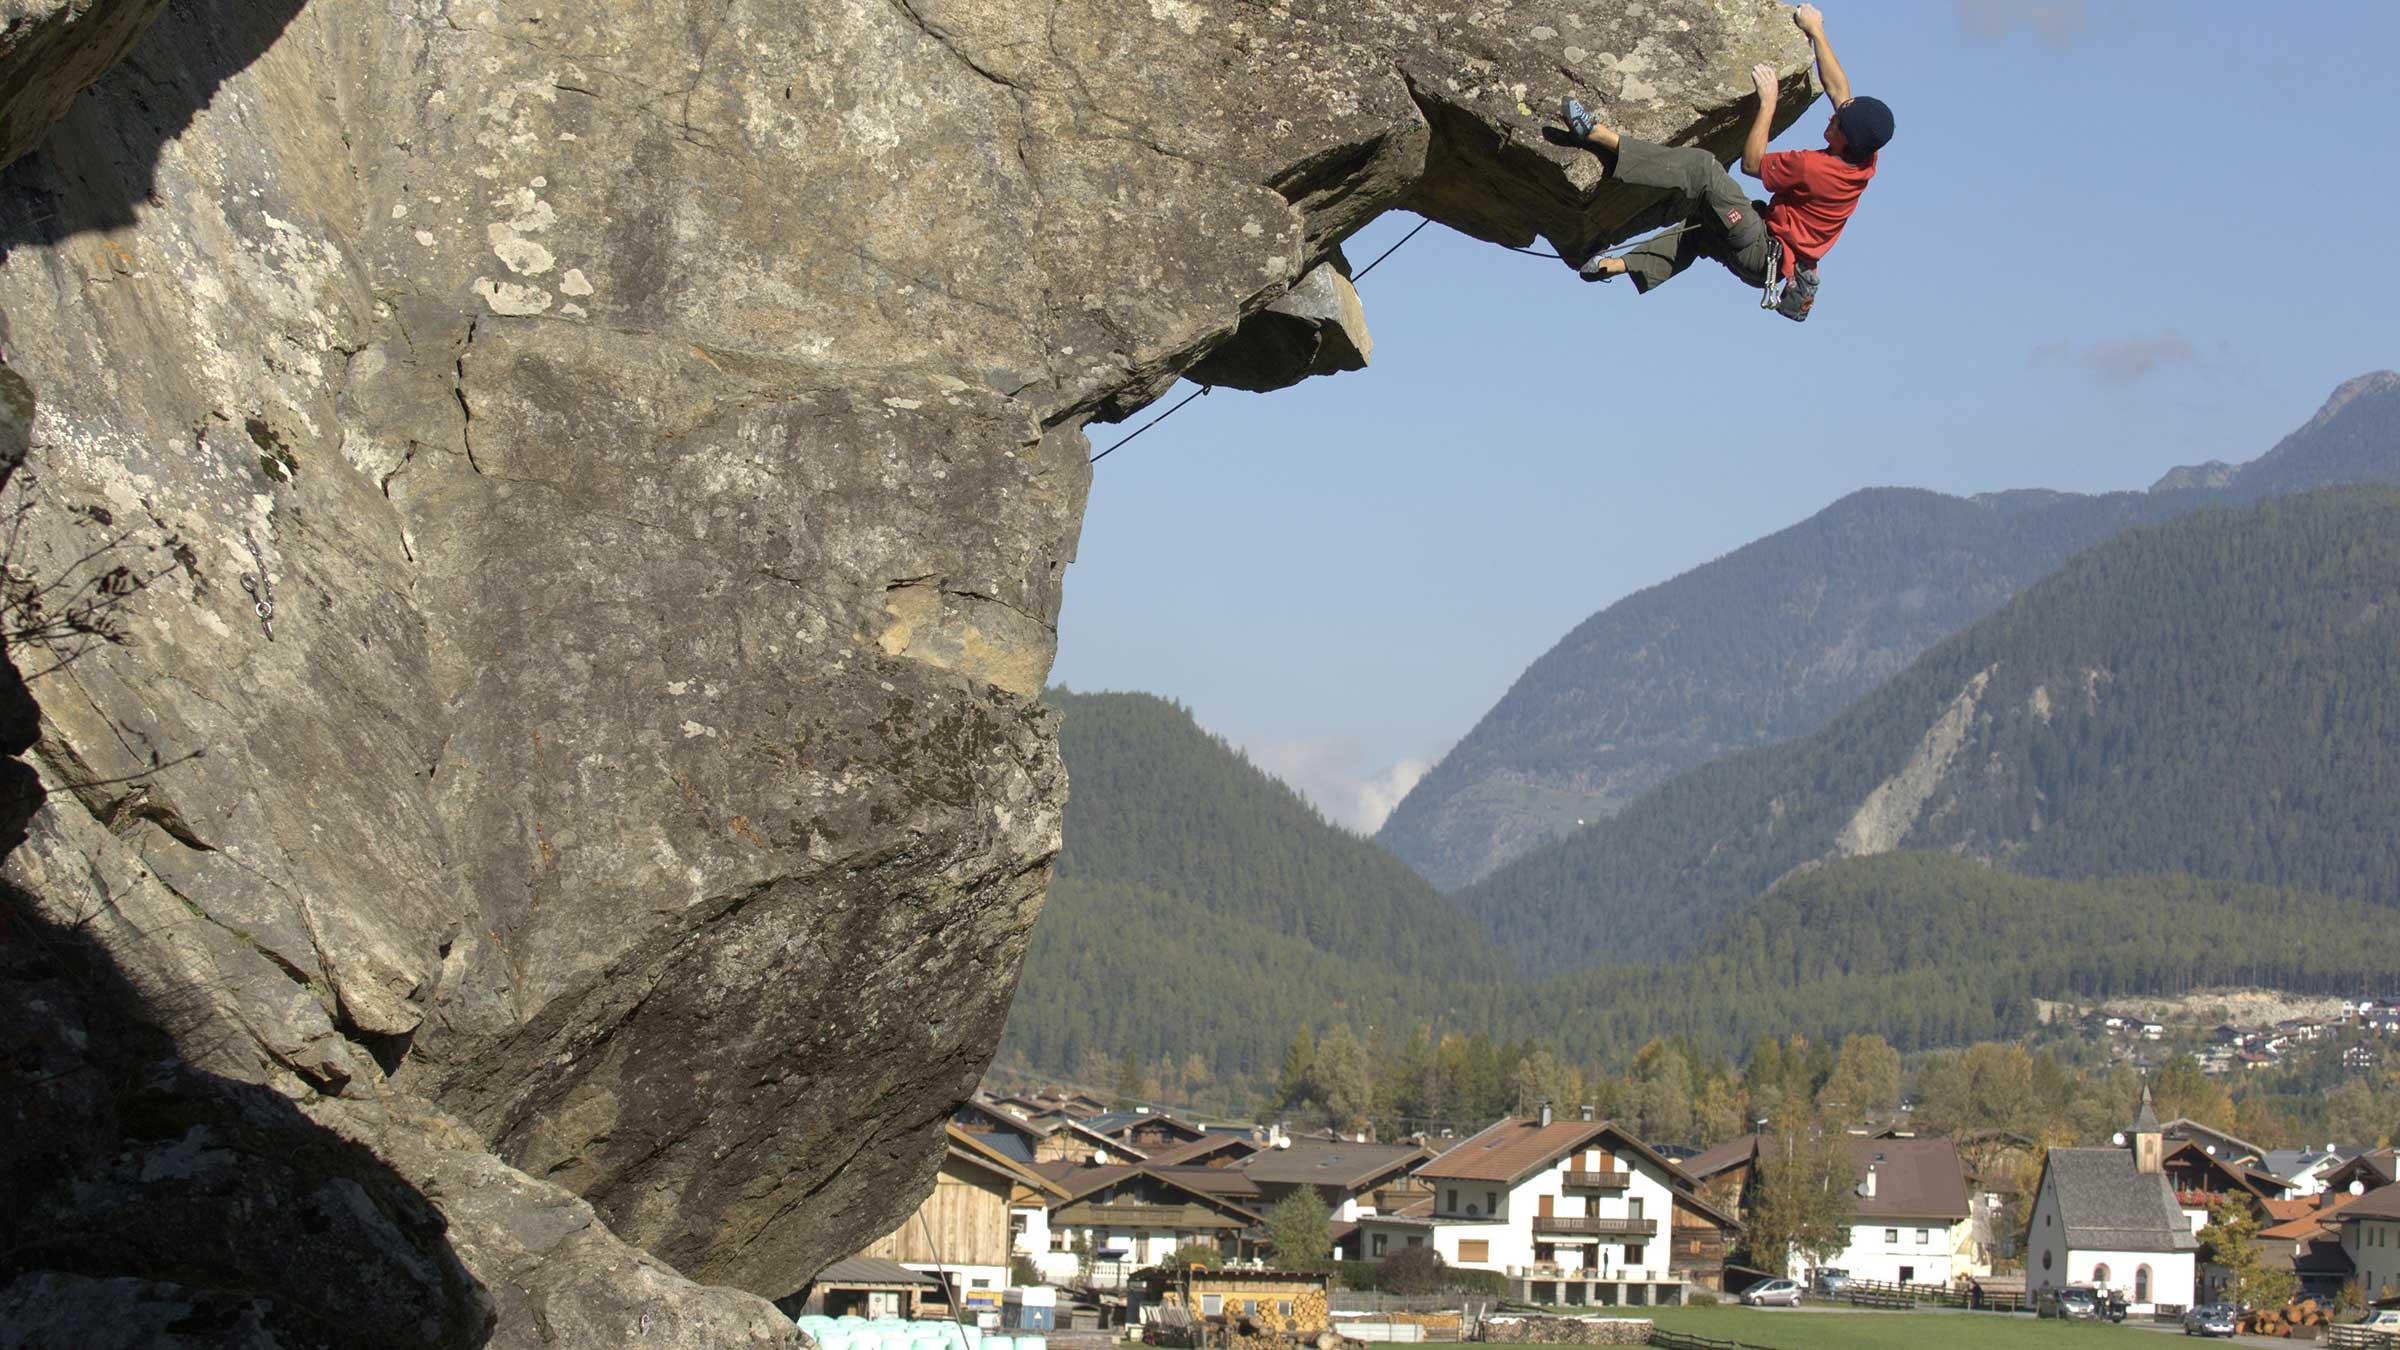 David Lama beim Klettern in Längenfeld - Tirol Klettern